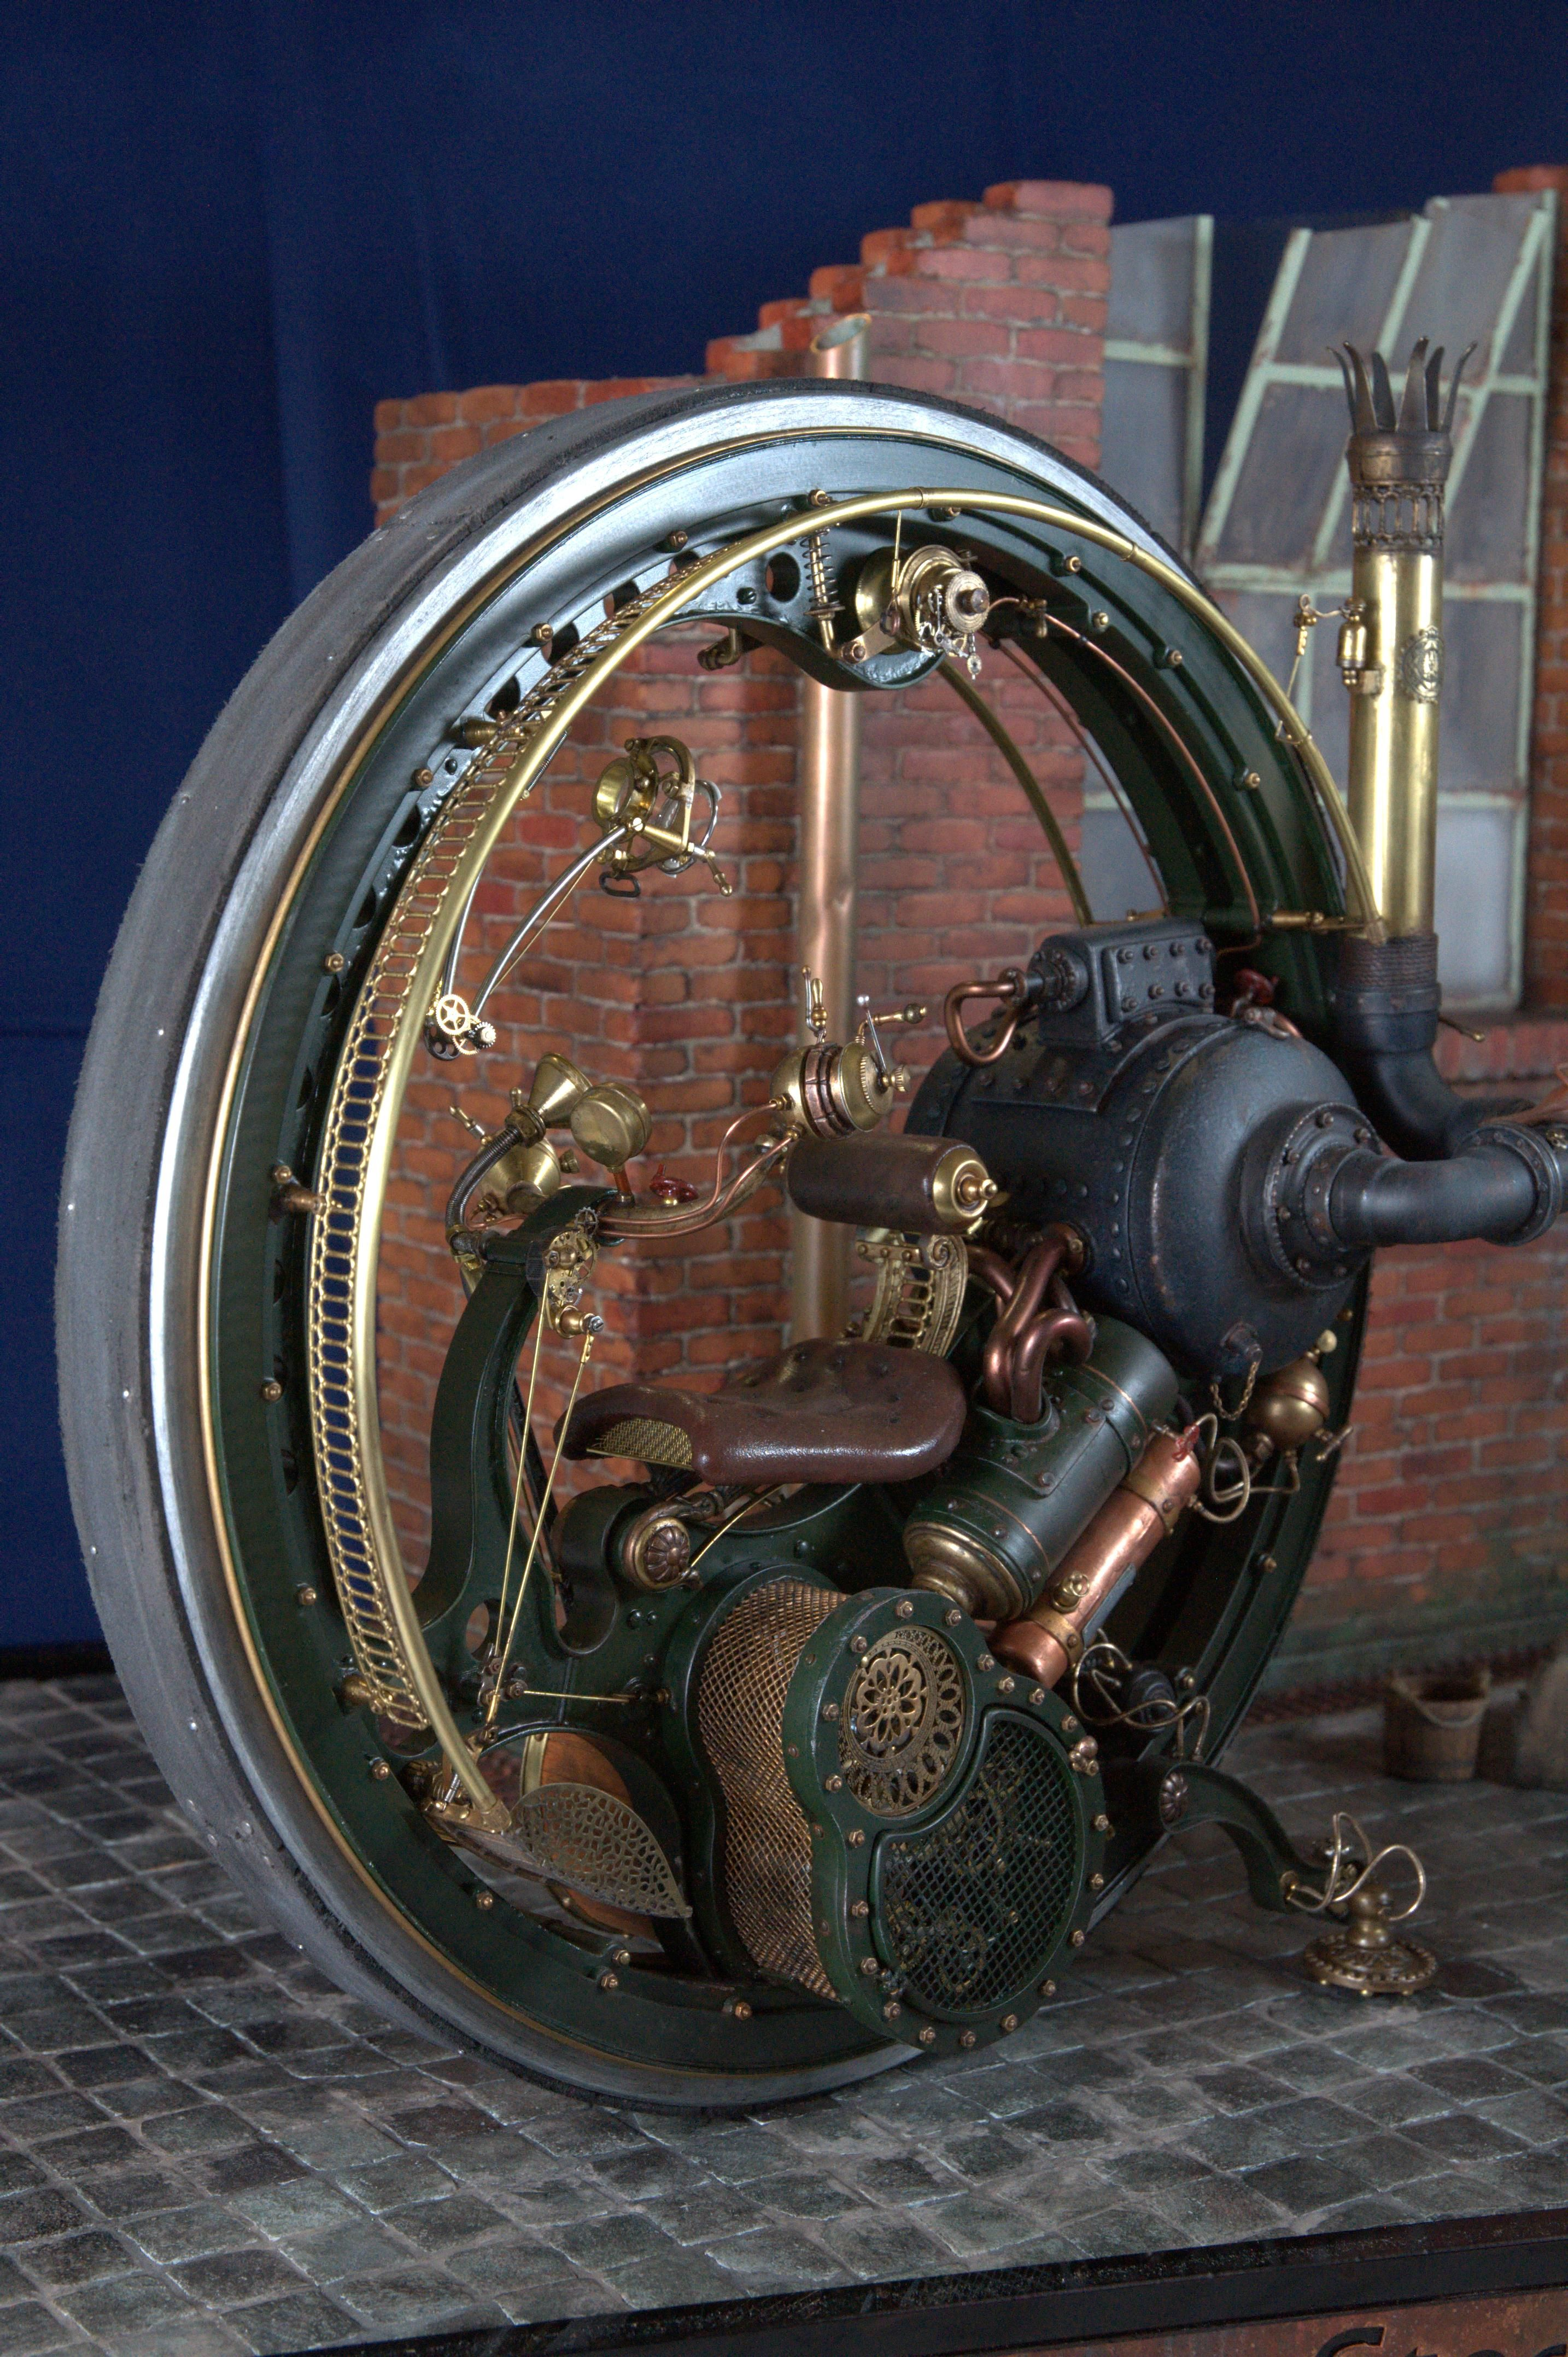 Modern Steampunk Monobike - London 1896 Awesome